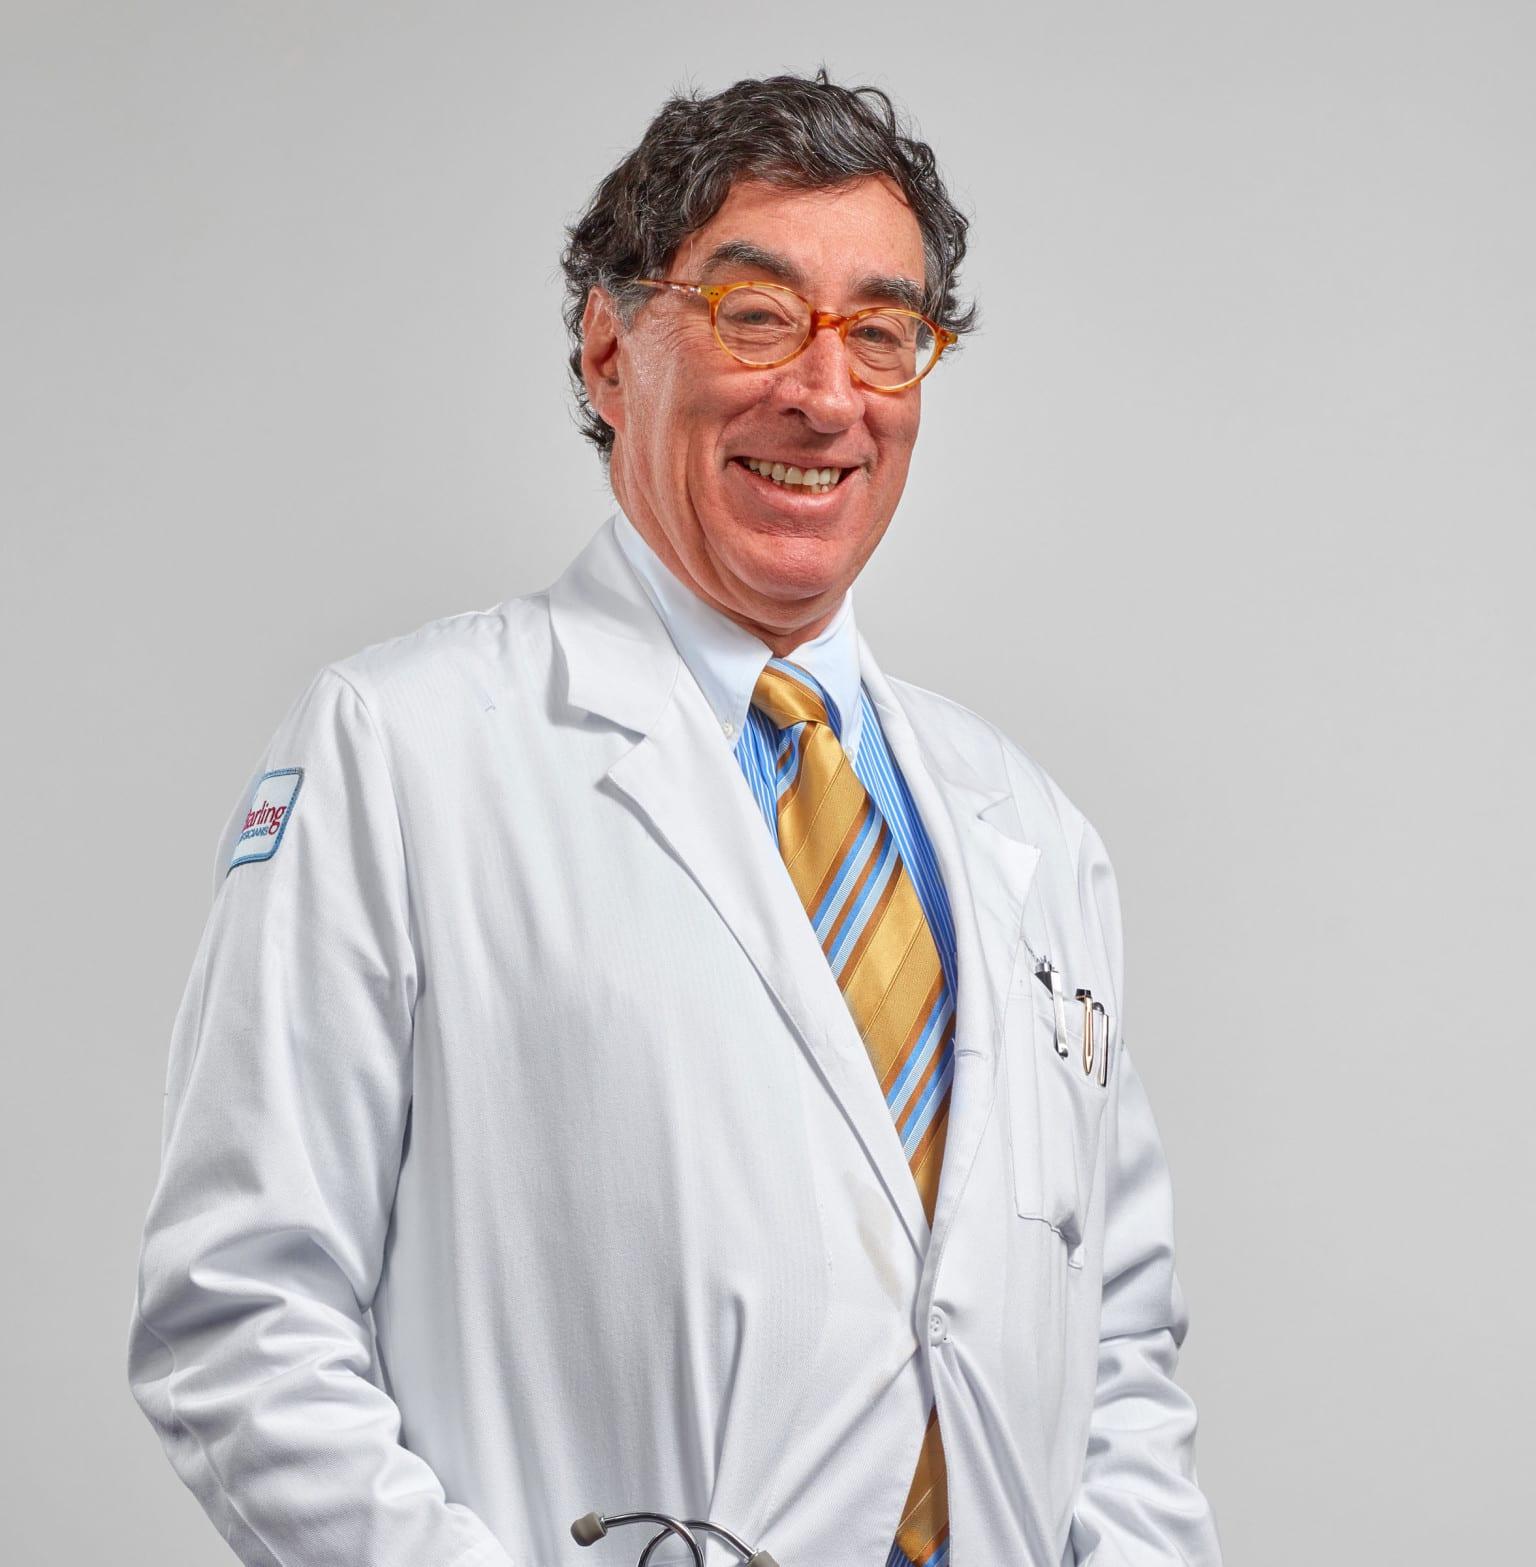 Dr. Stephen I Firshein MD